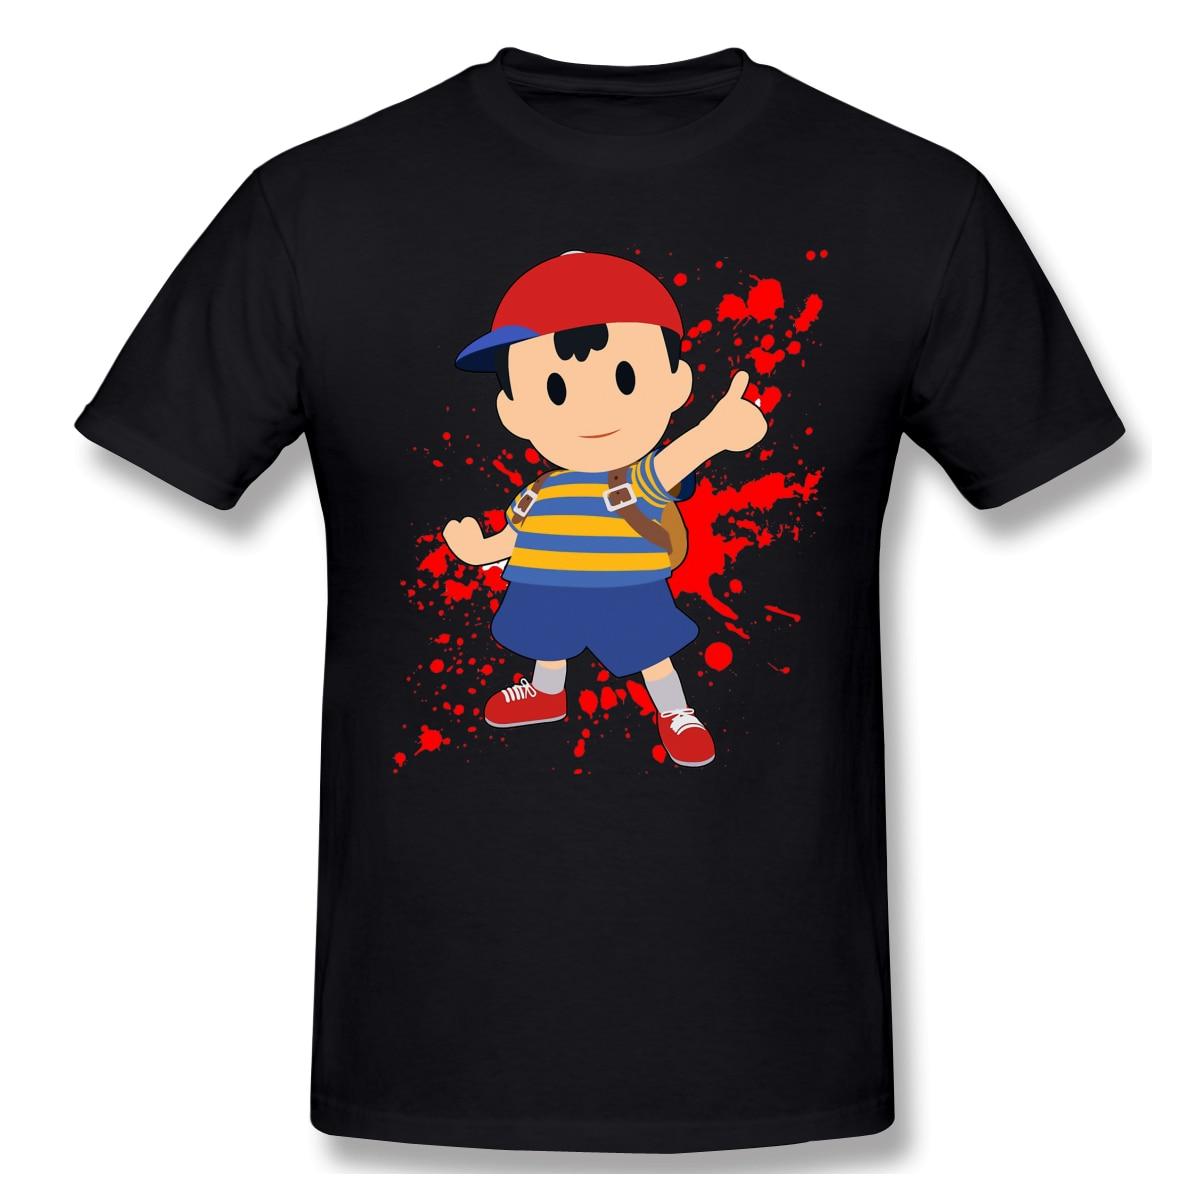 Ness - Super Smash BrosT-Shirt Men Top Quality 100% Cotton Short Summer Sleeve legend of zelda Casual Tshirt Loose